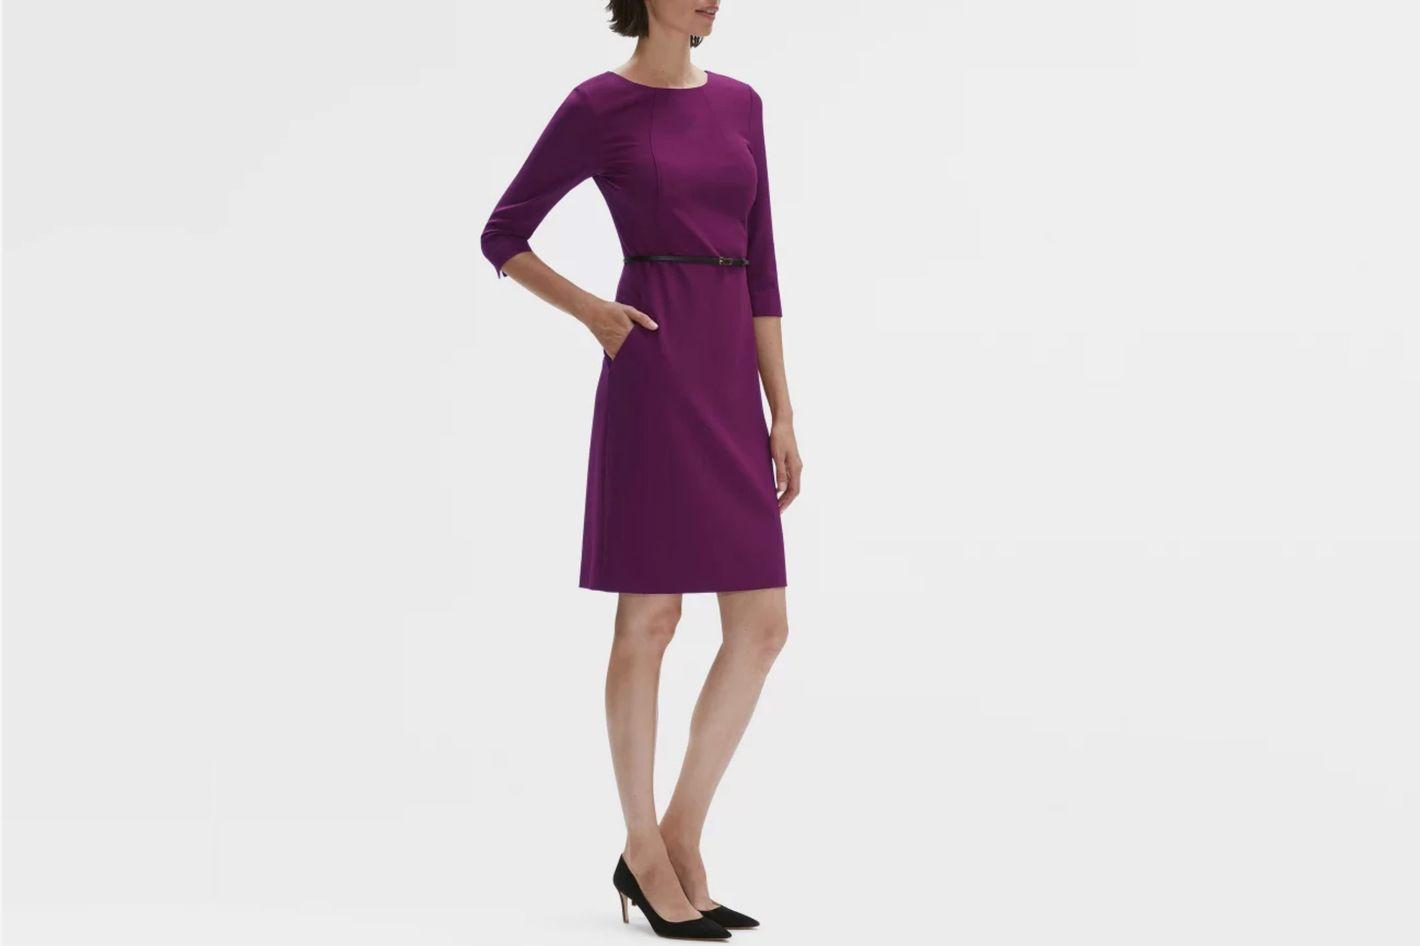 The Etsuko Dress